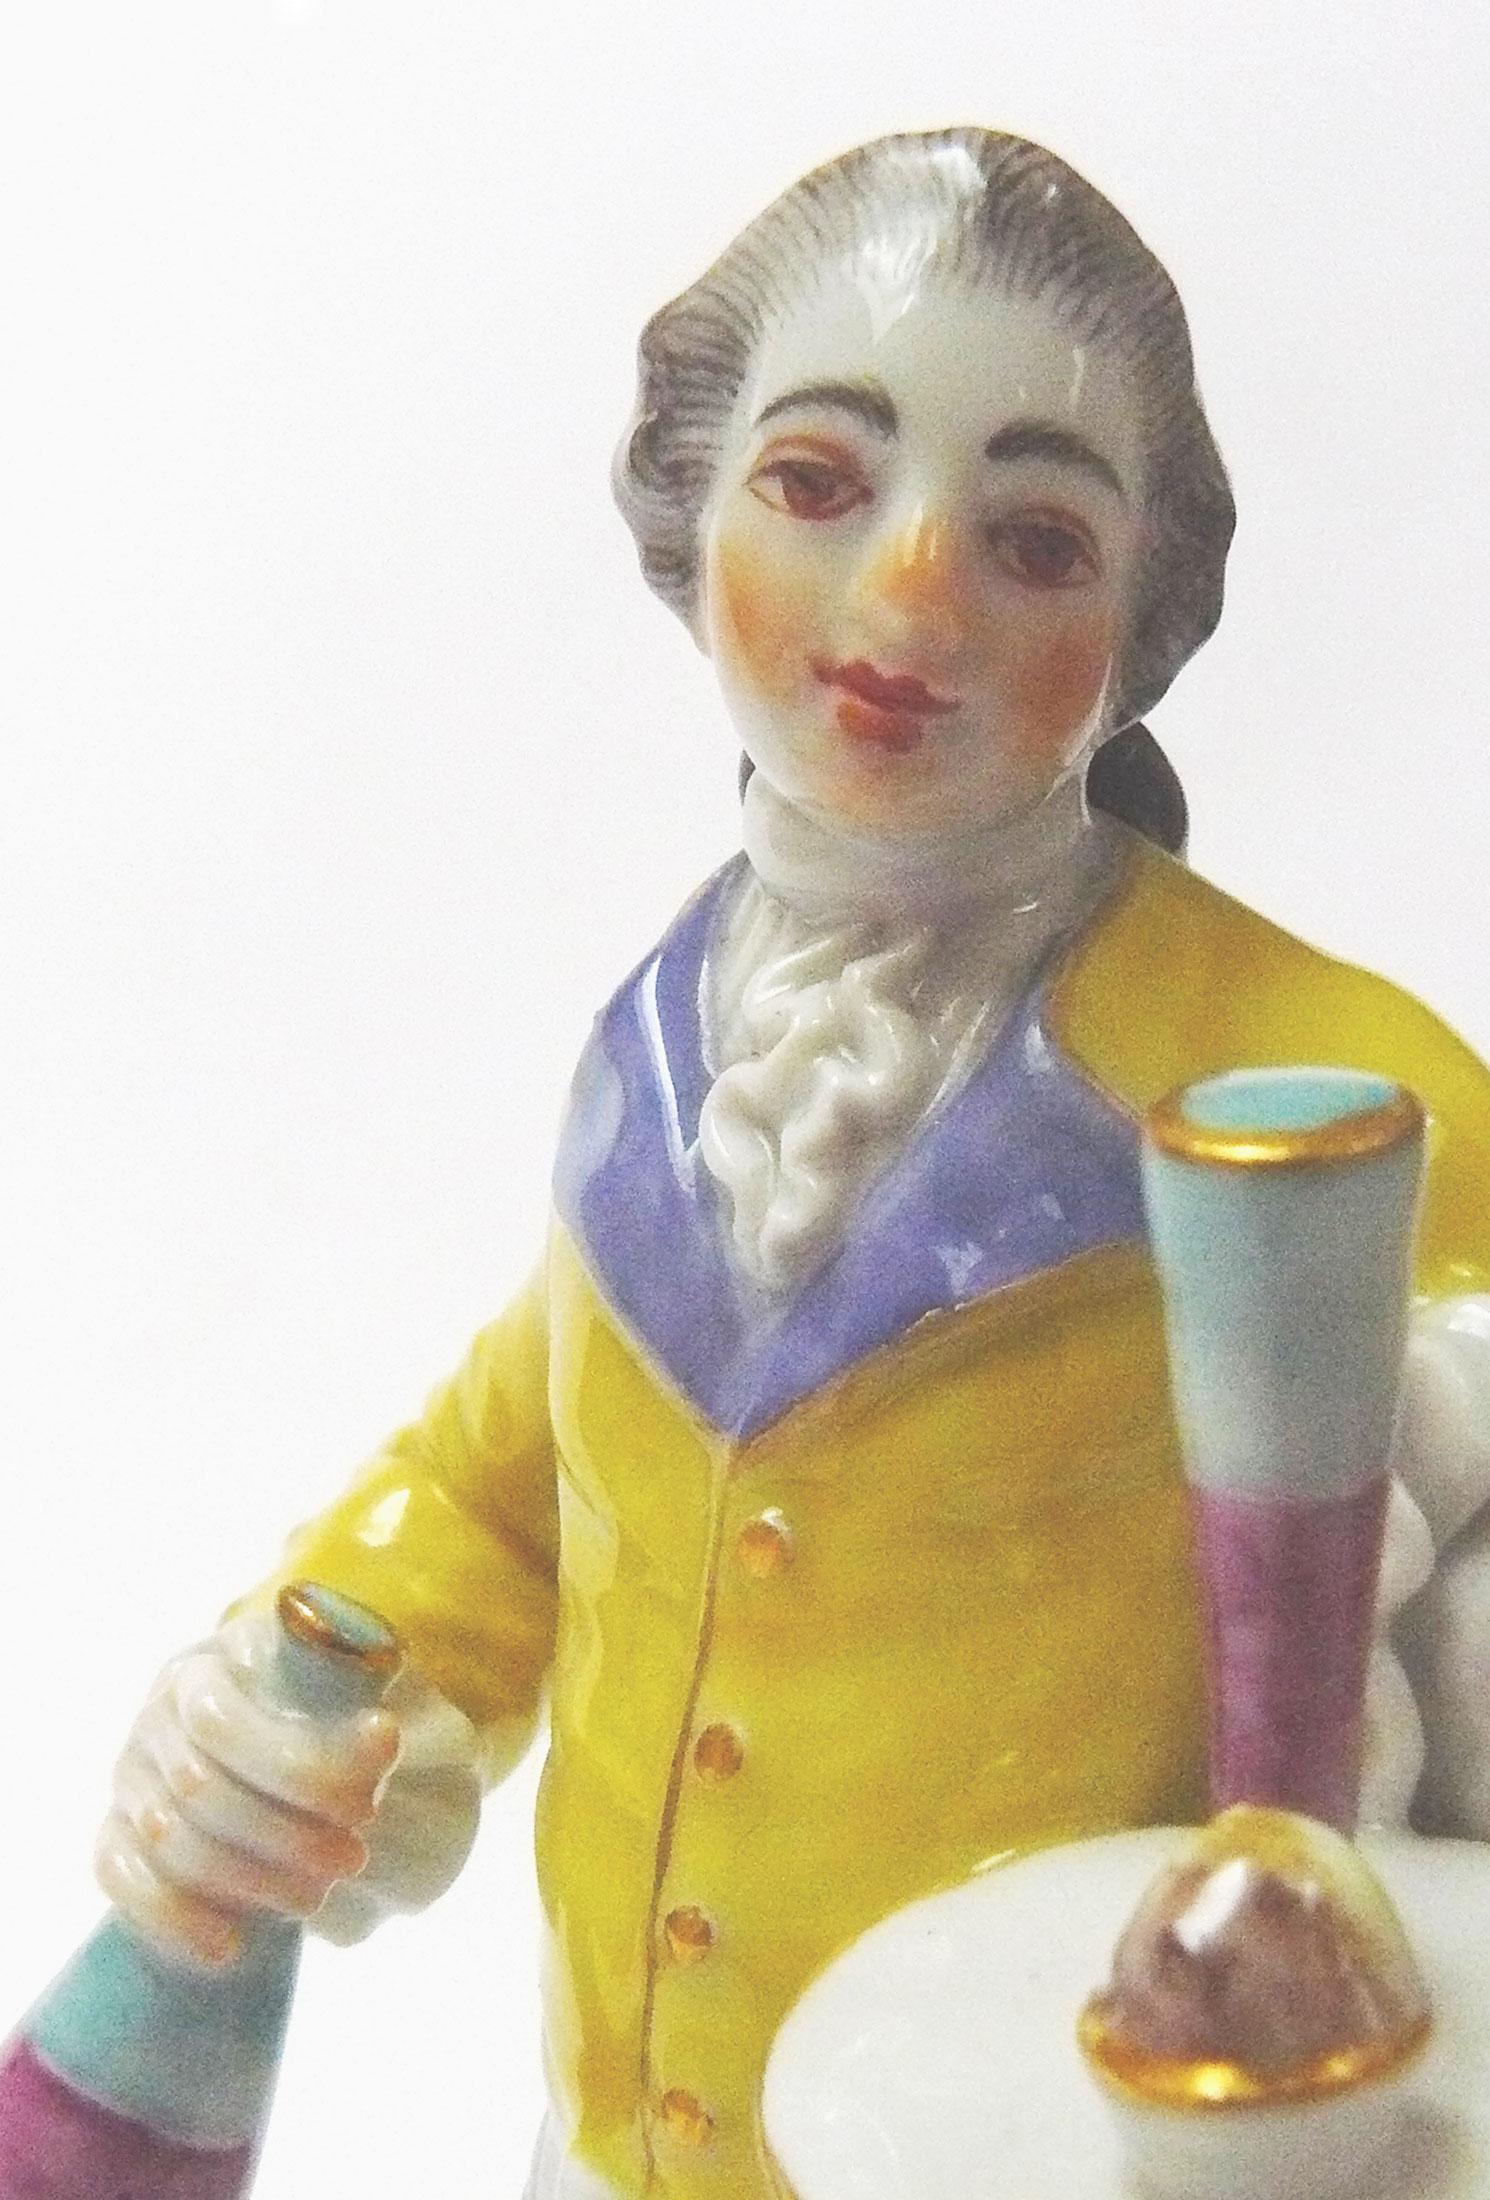 Cris de Paris, crier for lemonade, J.J. Kaendler, Meißen